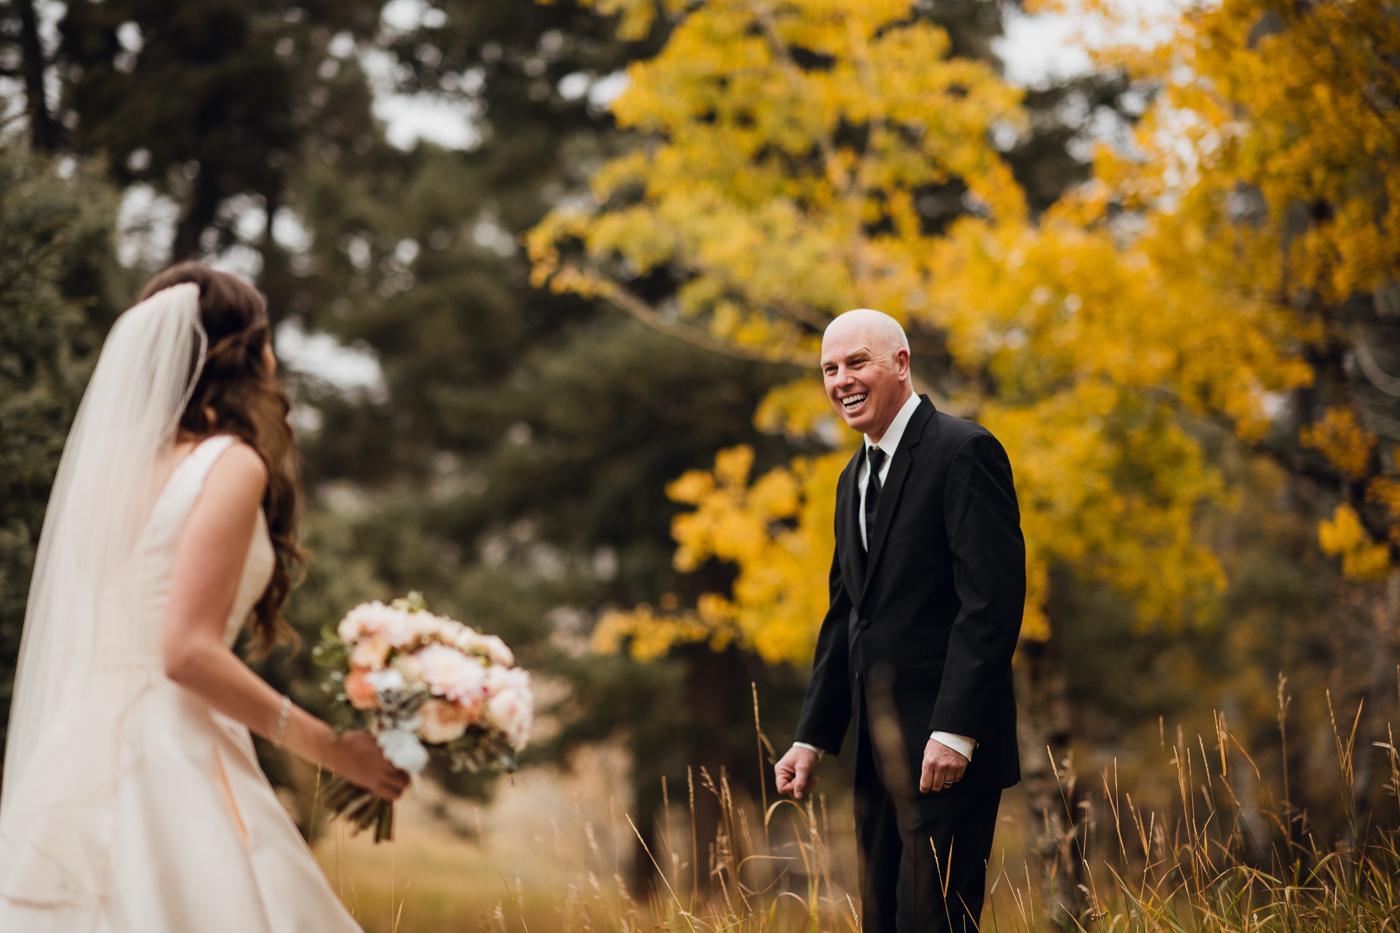 Candice Rawlin Wedding PHOCO Photography Pines Genesee Golden Colorado Fog -18.jpg